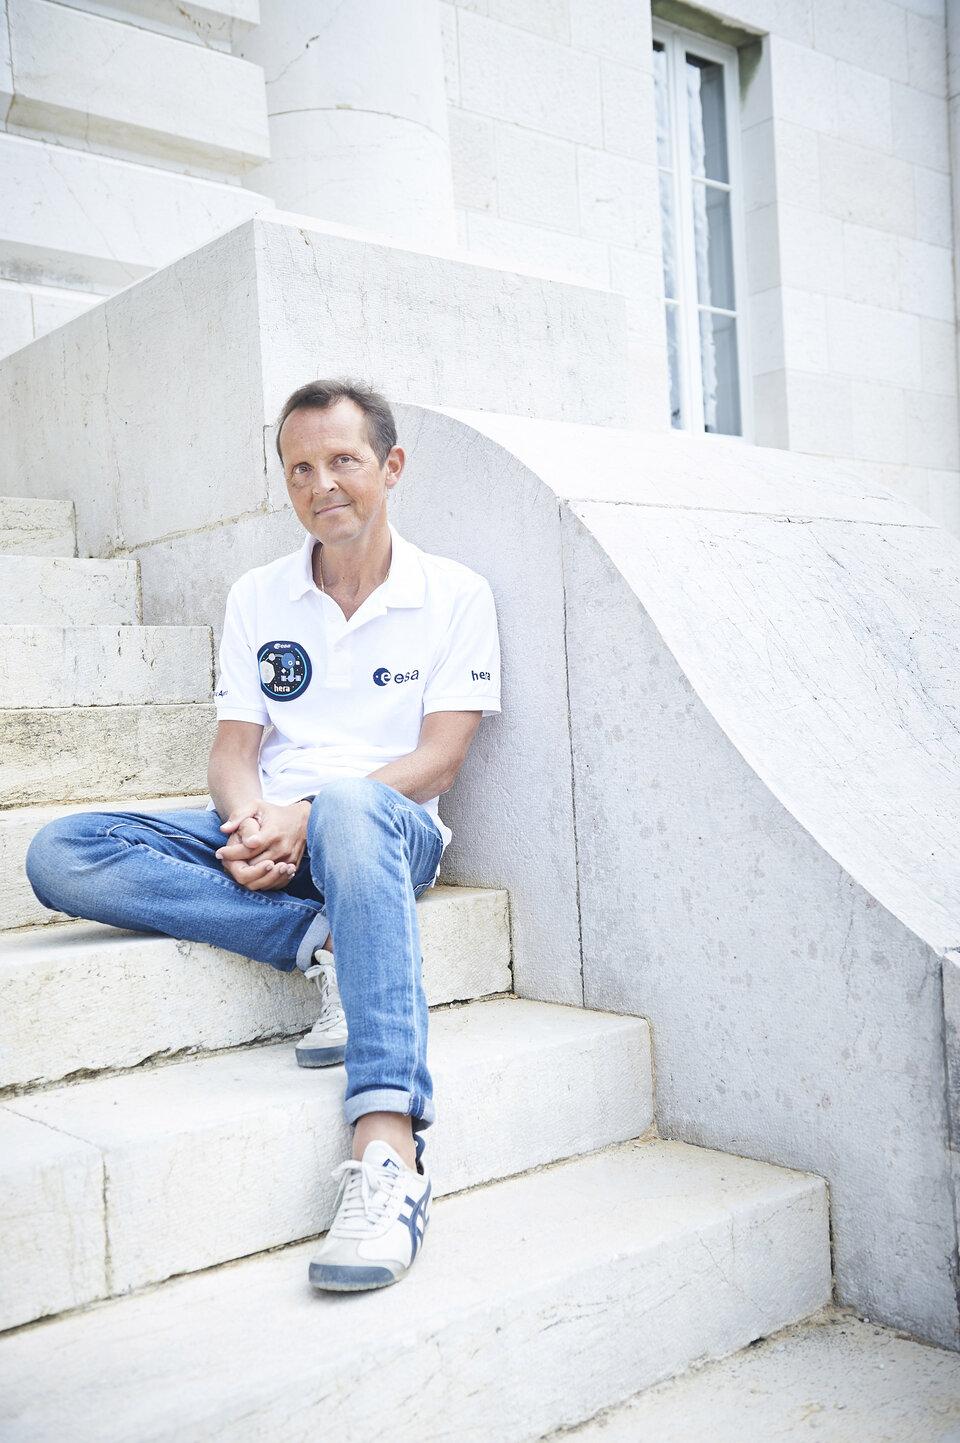 Patrick Michel, investigateur principal de la mission Hera